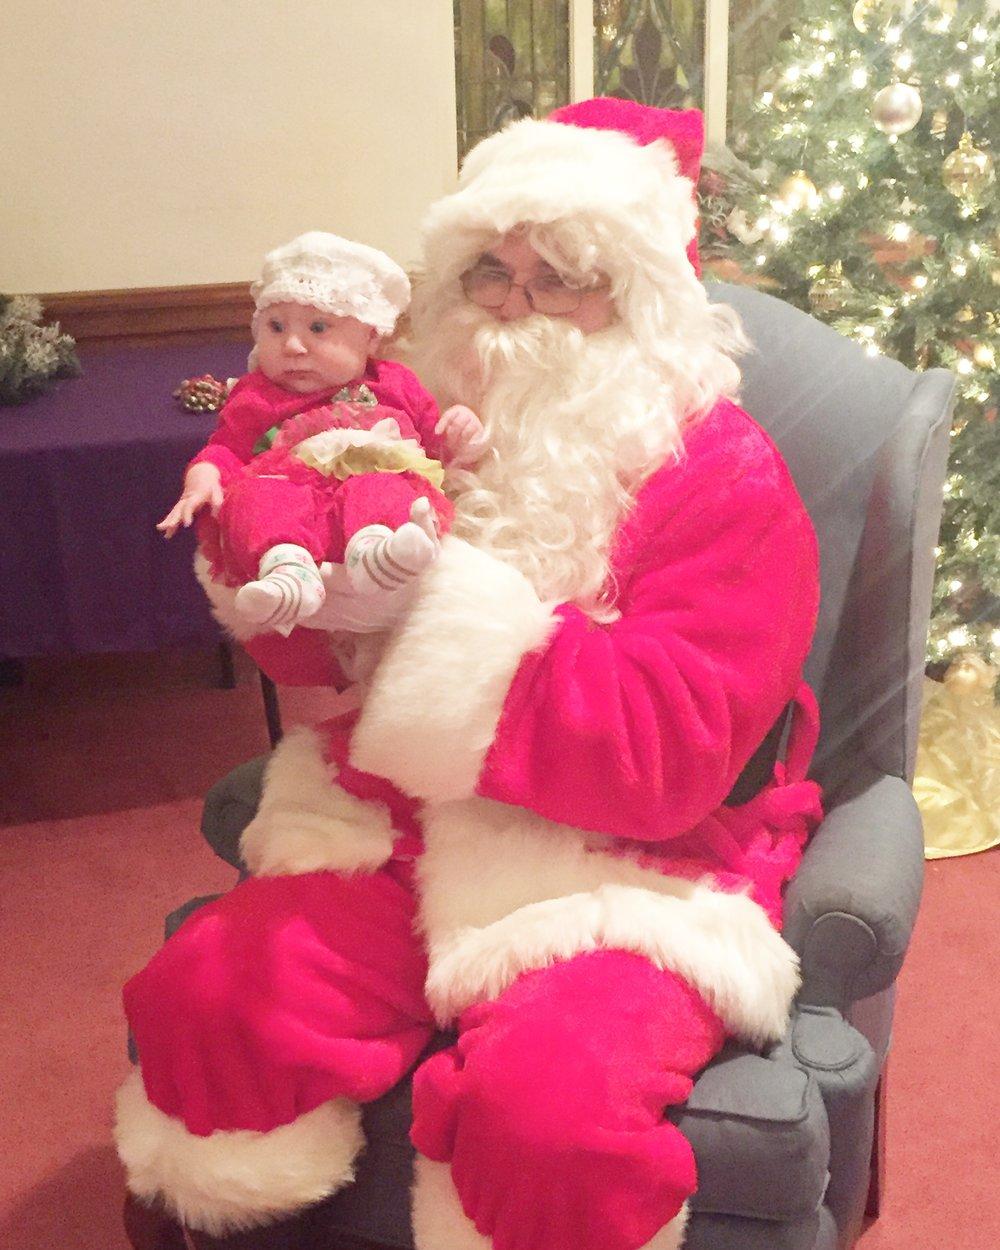 June got to meet Santa! He said she's on the Nice list.